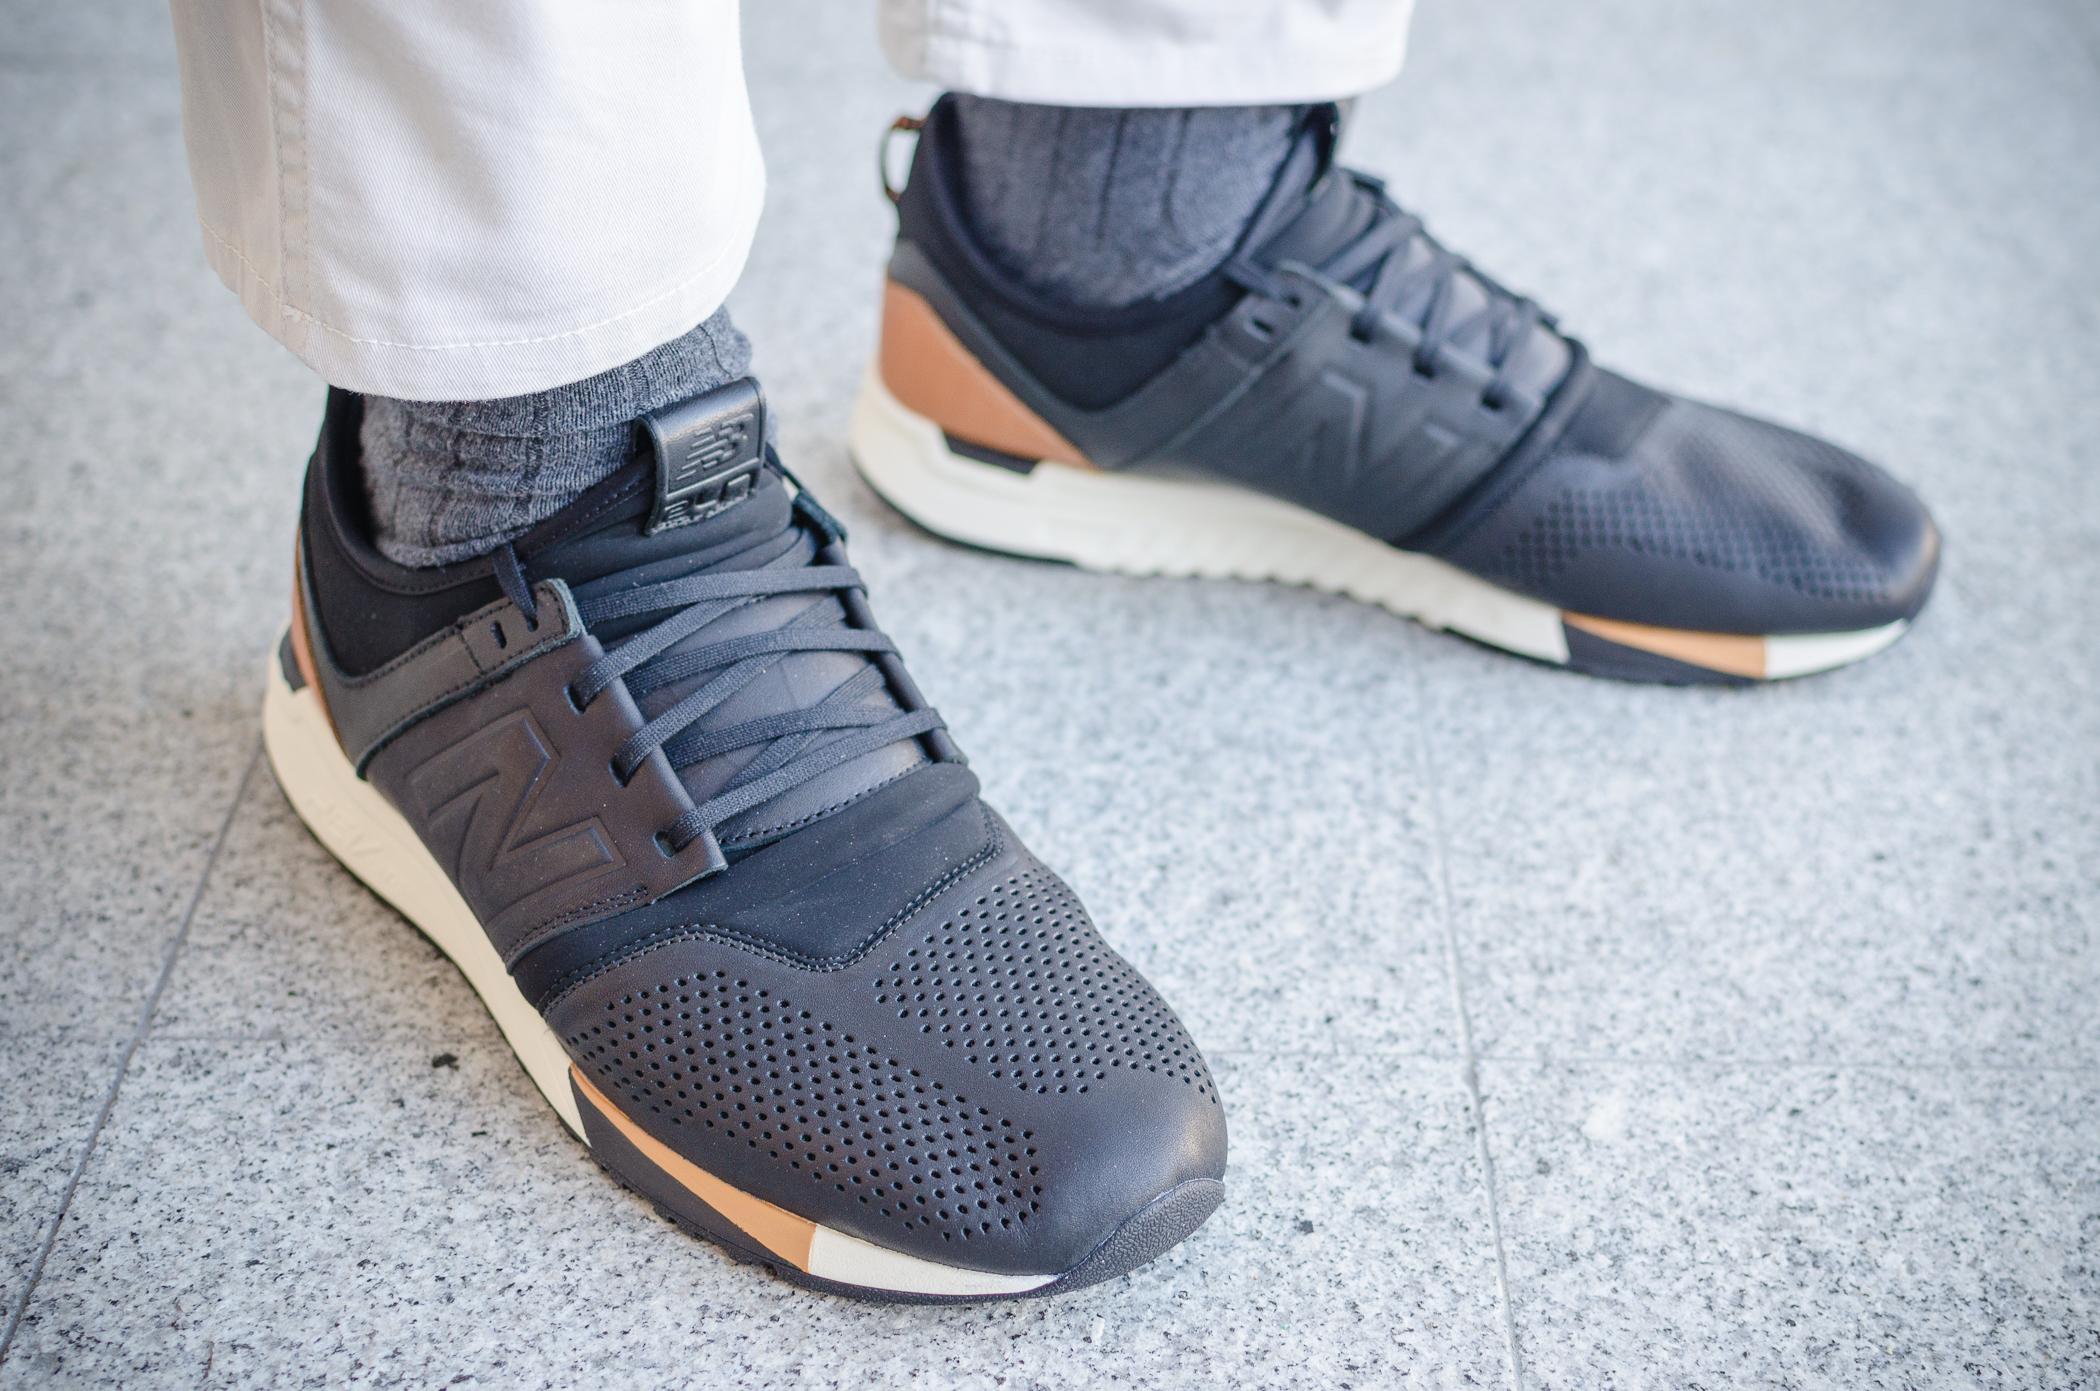 new balance 247 black on feet